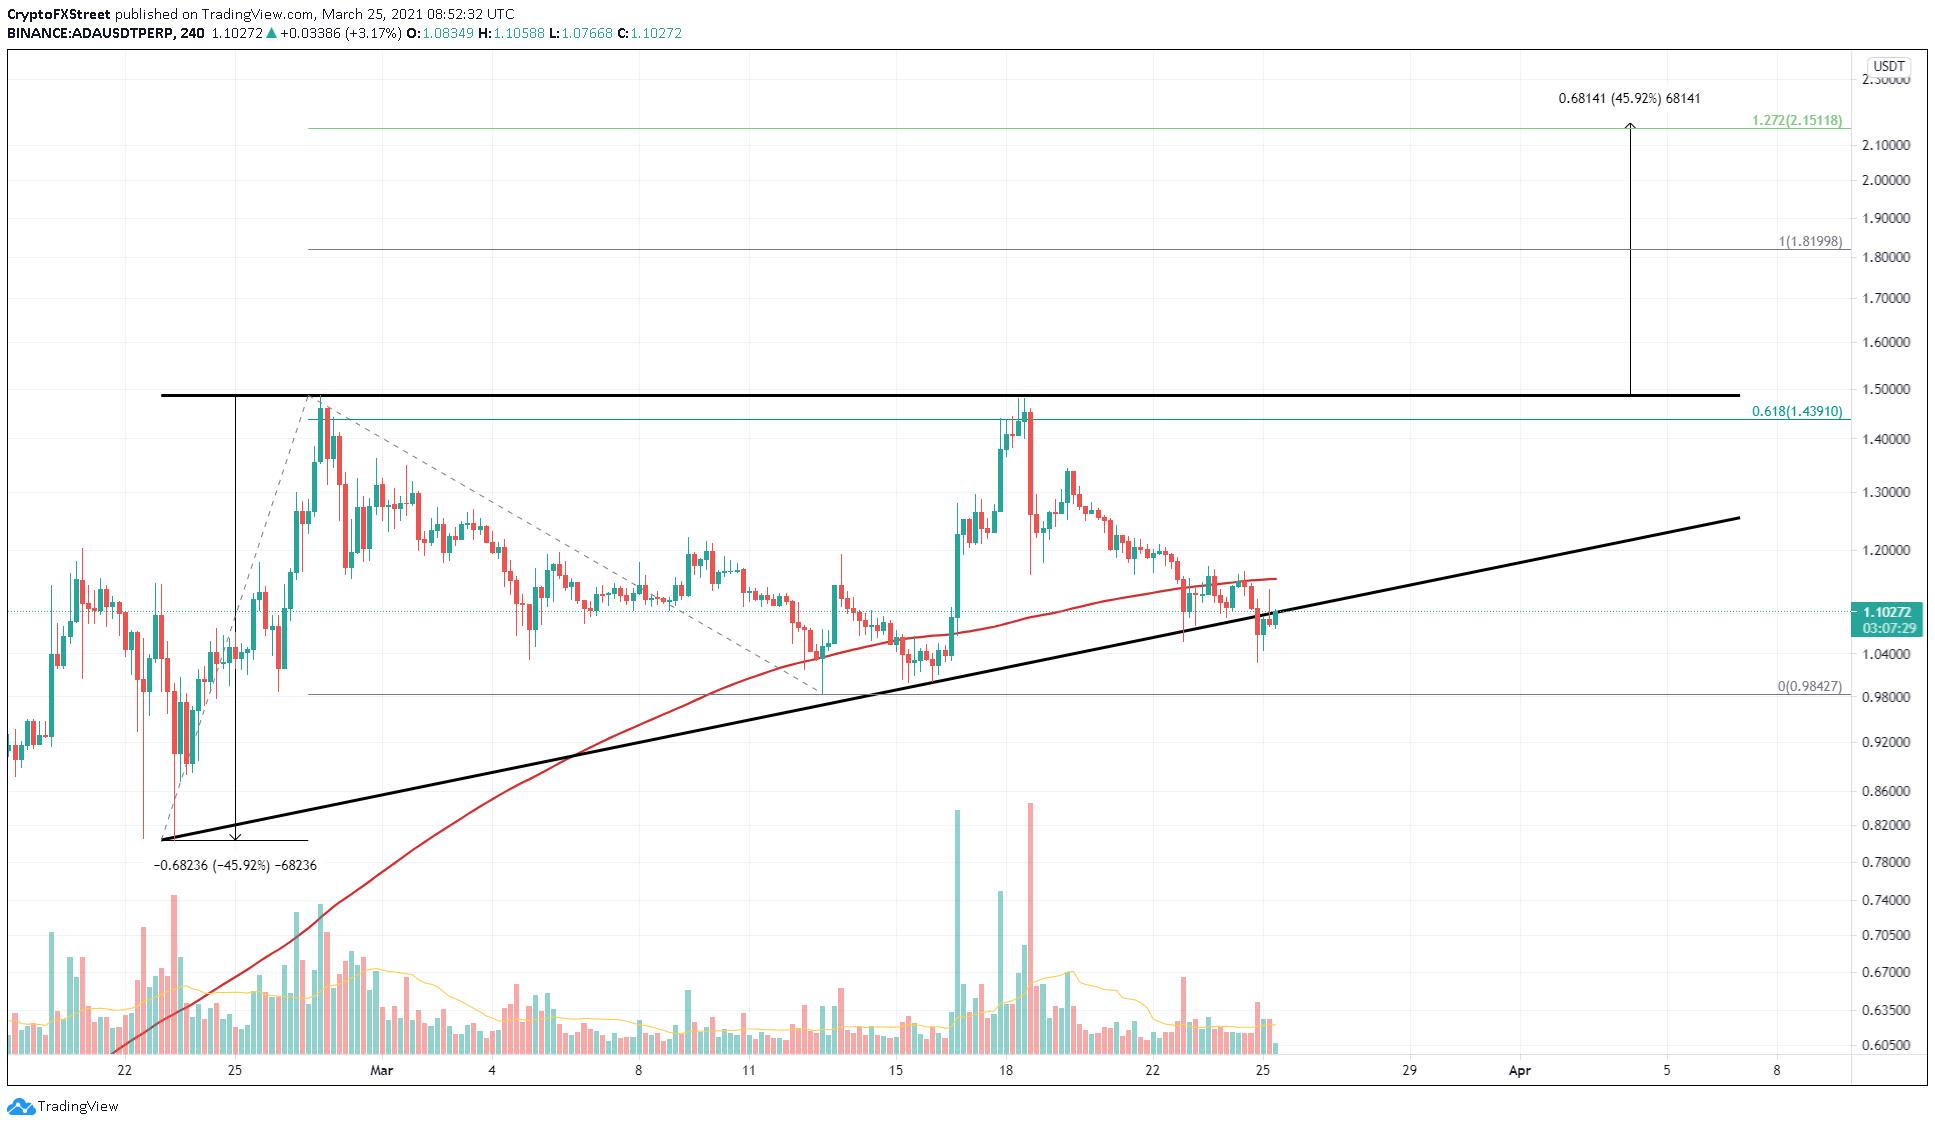 ADA/USDT 4-hour chart